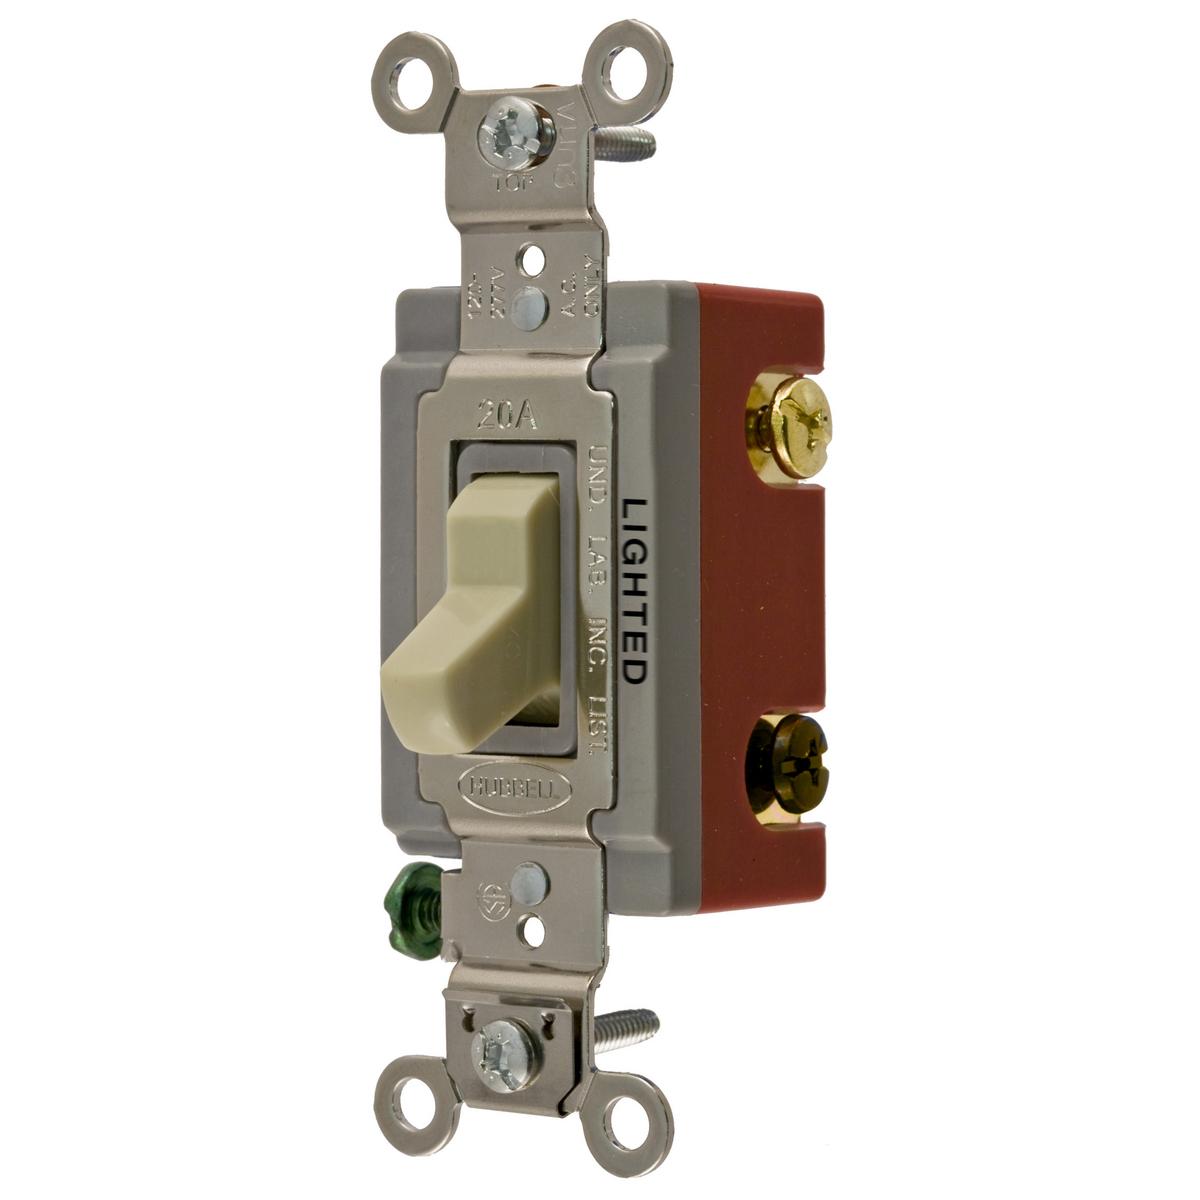 wiring device kellems hubhbl1223il 3 way tog ind grd 20a 120 277v rh unitedelectric com